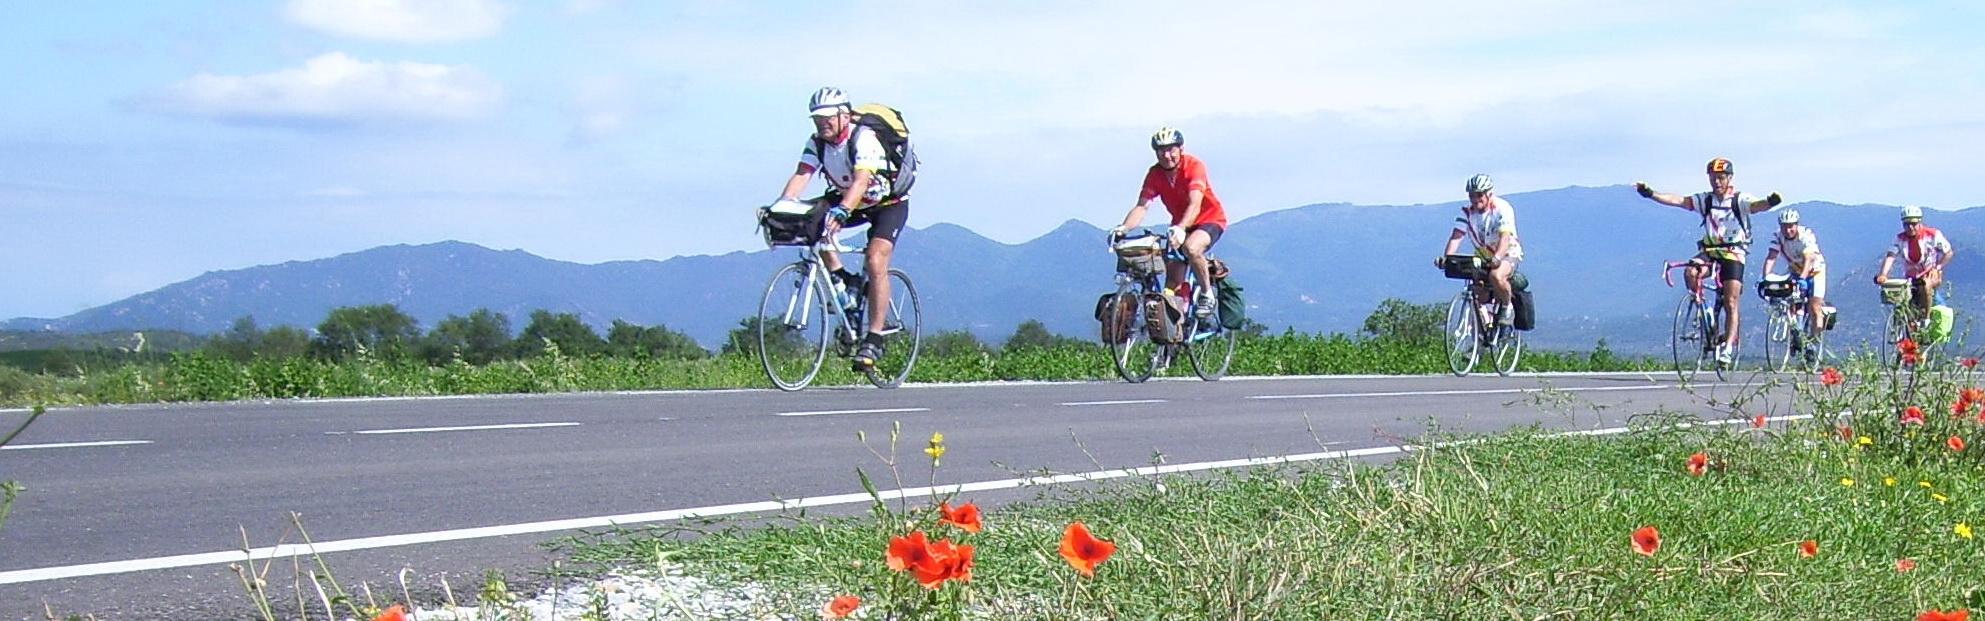 Association  Sportive  Gazelec  Gardois  Cyclo  Aramon  F.F.C.T.